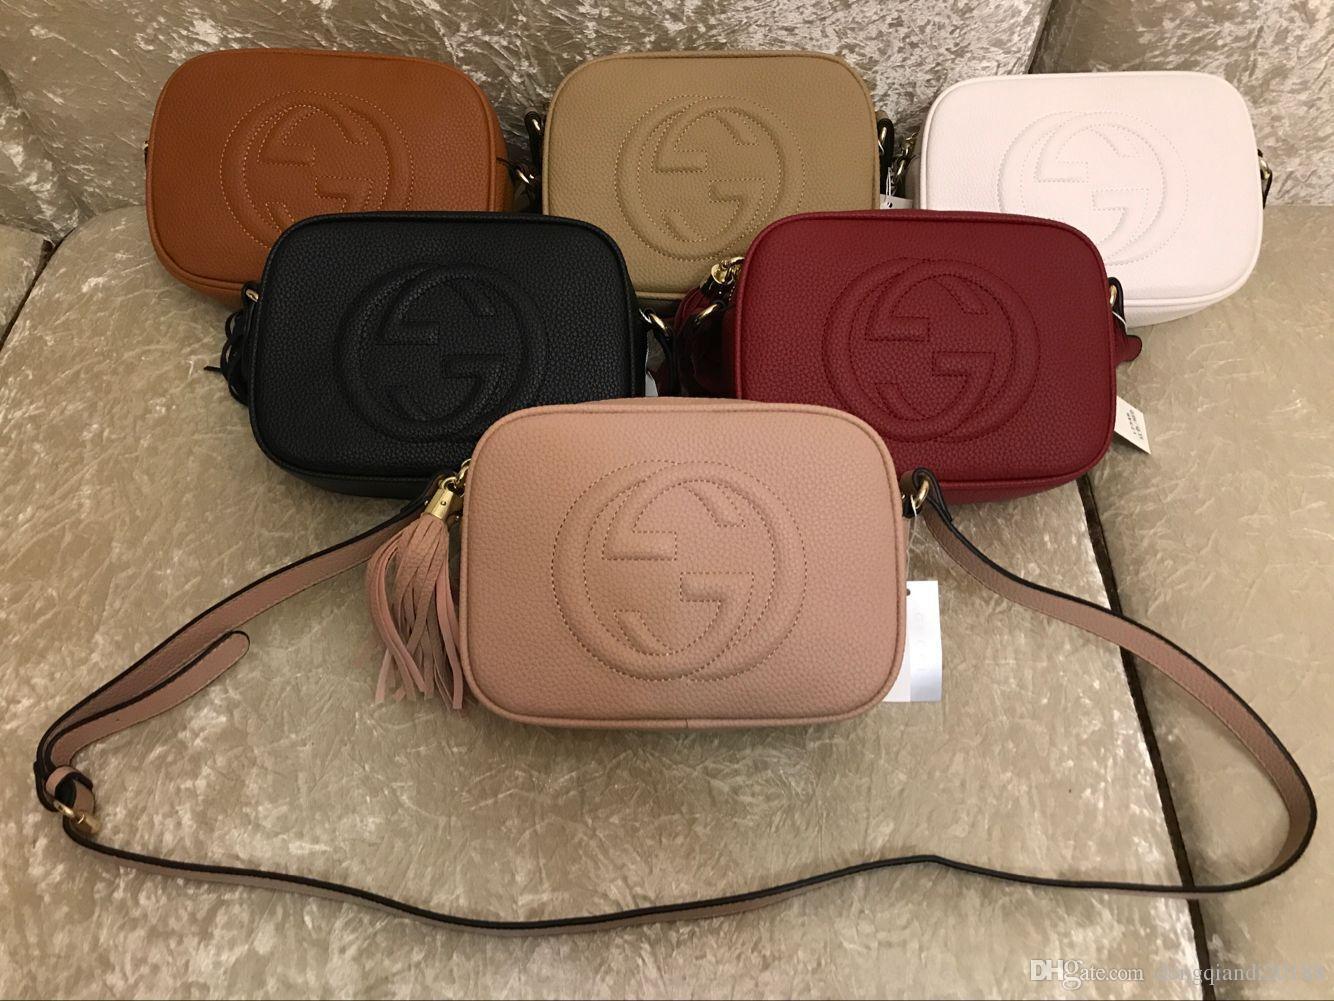 7c60da9cb9eccb 2018 HOT Disco Leather Shoulder Bag Messenger Soho Bag 308364 Handbag Bag  308364 Online with $26.35/Piece on Dengqiandi20188's Store   DHgate.com